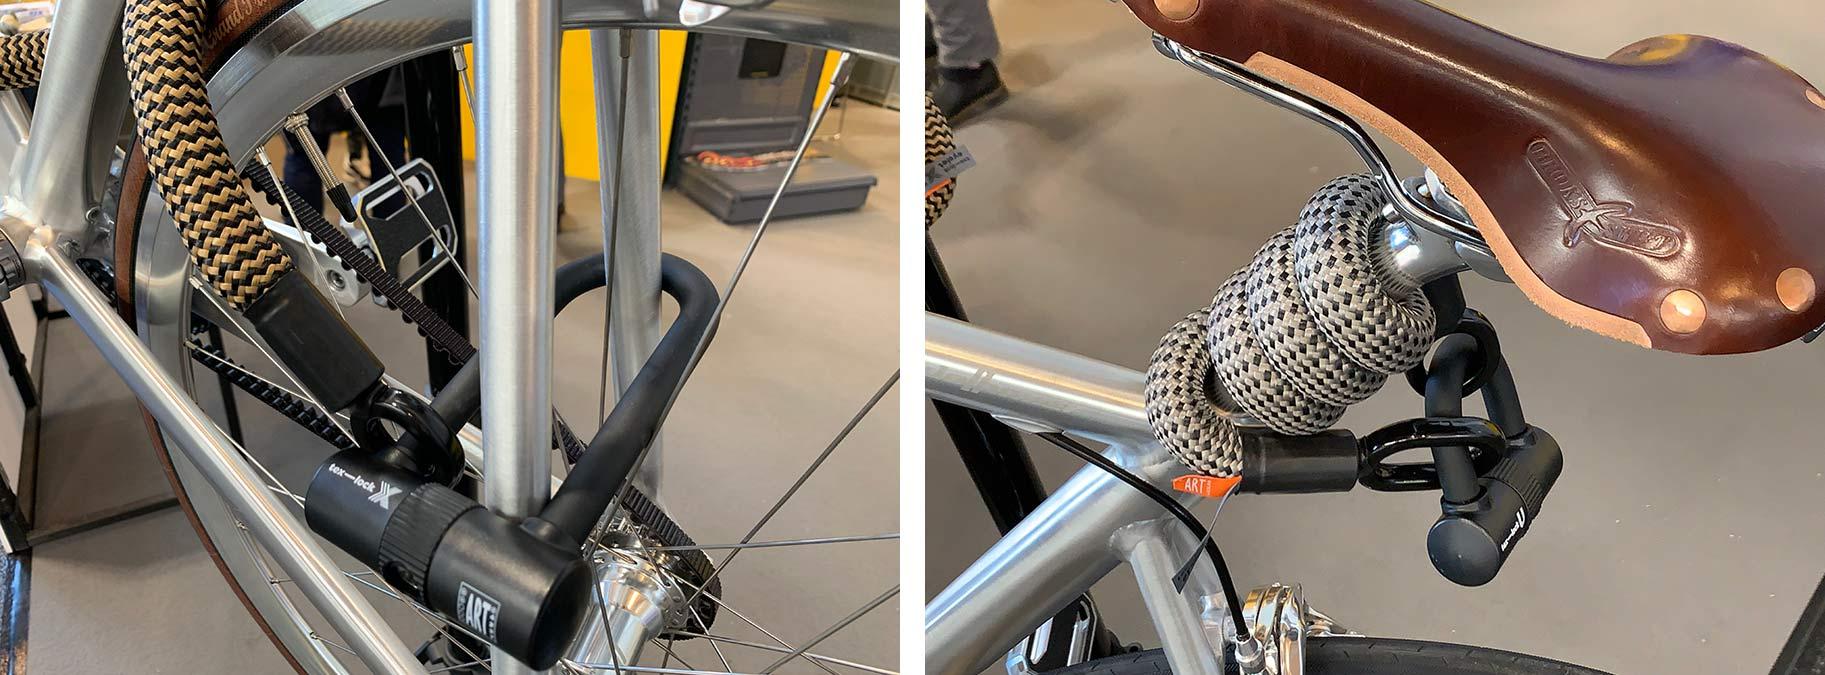 Tex-Lock cable and u-lock shackle combo bicycle locks